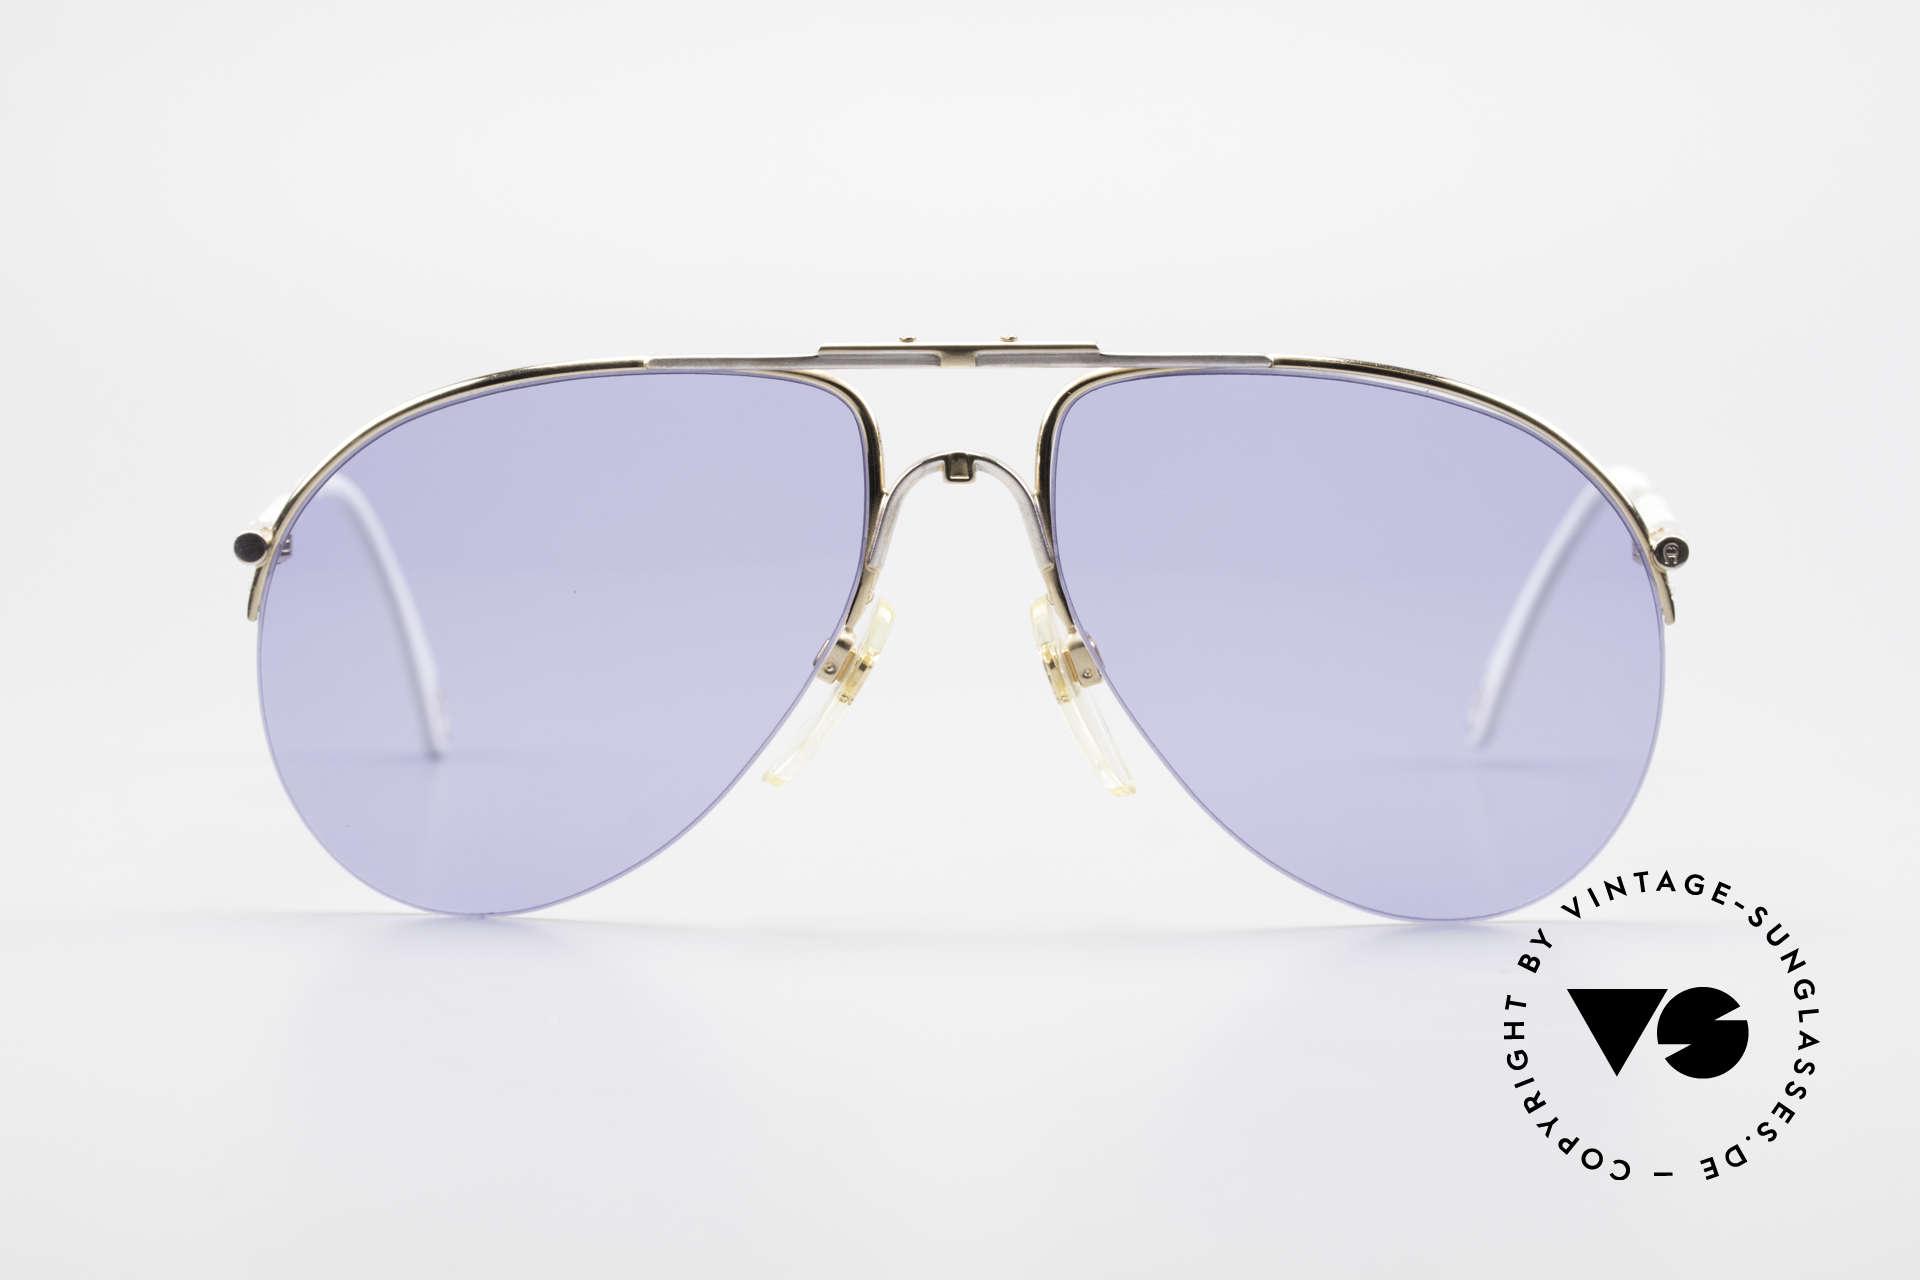 Aigner EA2 Rare 80's Vintage Sunglasses, noble modified 'aviator design' & elegant frame coloring, Made for Men and Women